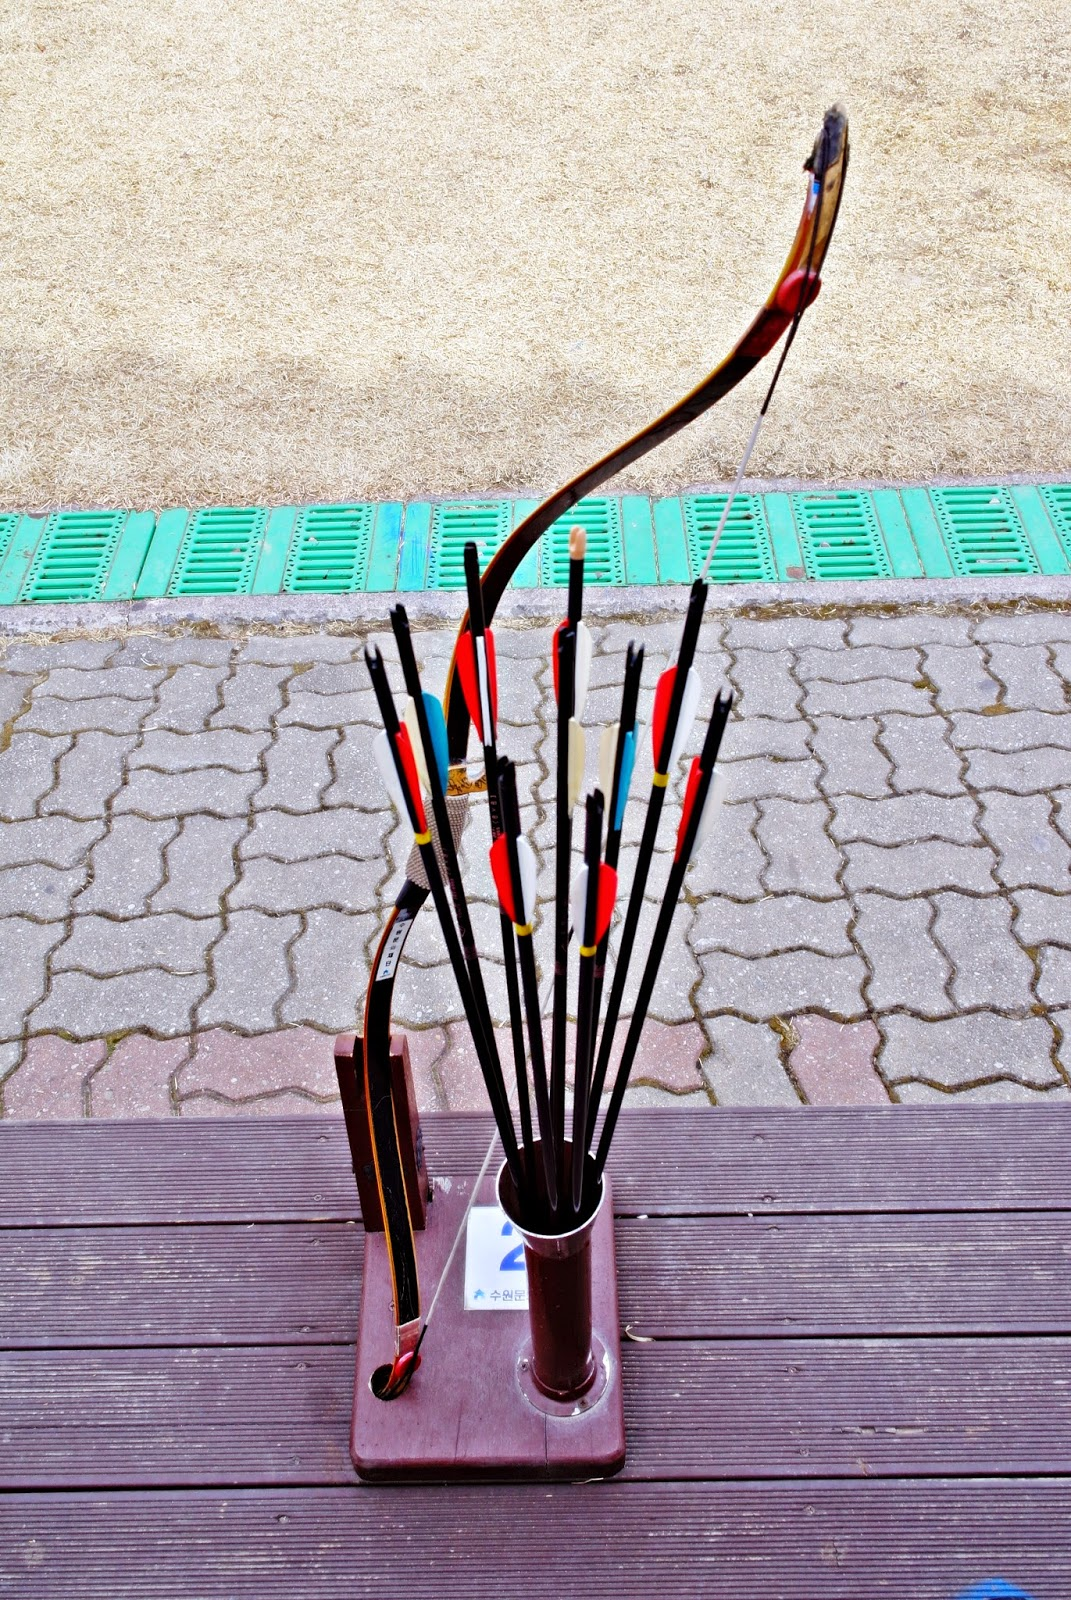 www.meheartseoul.blogspot.sg (Vera Lee)